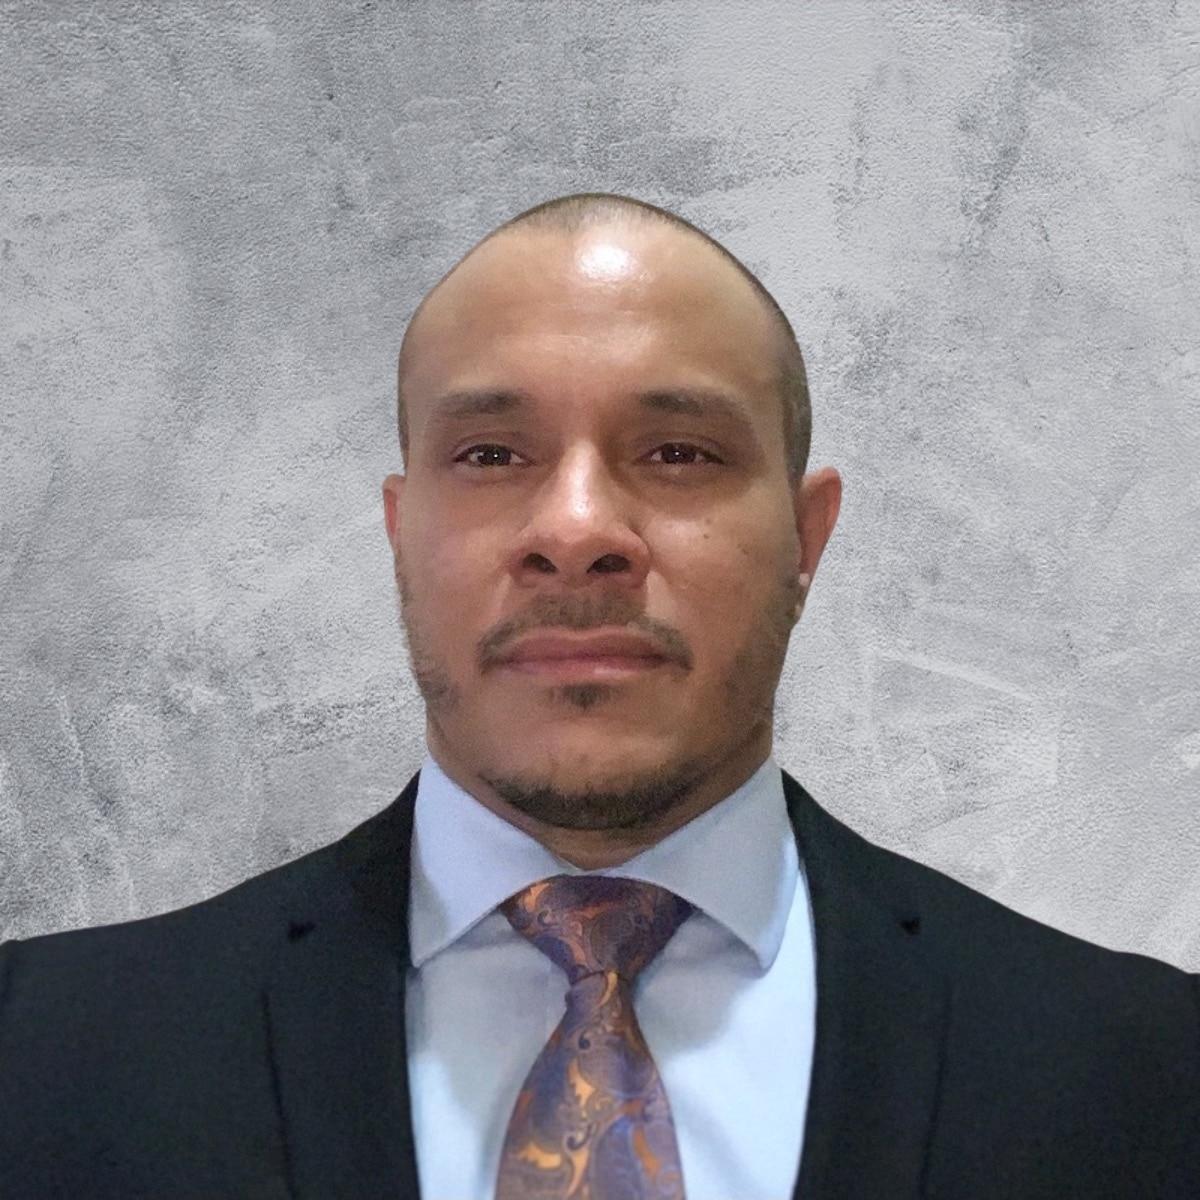 STEVEN CASTILLO Financial Professional & Insurance Agent